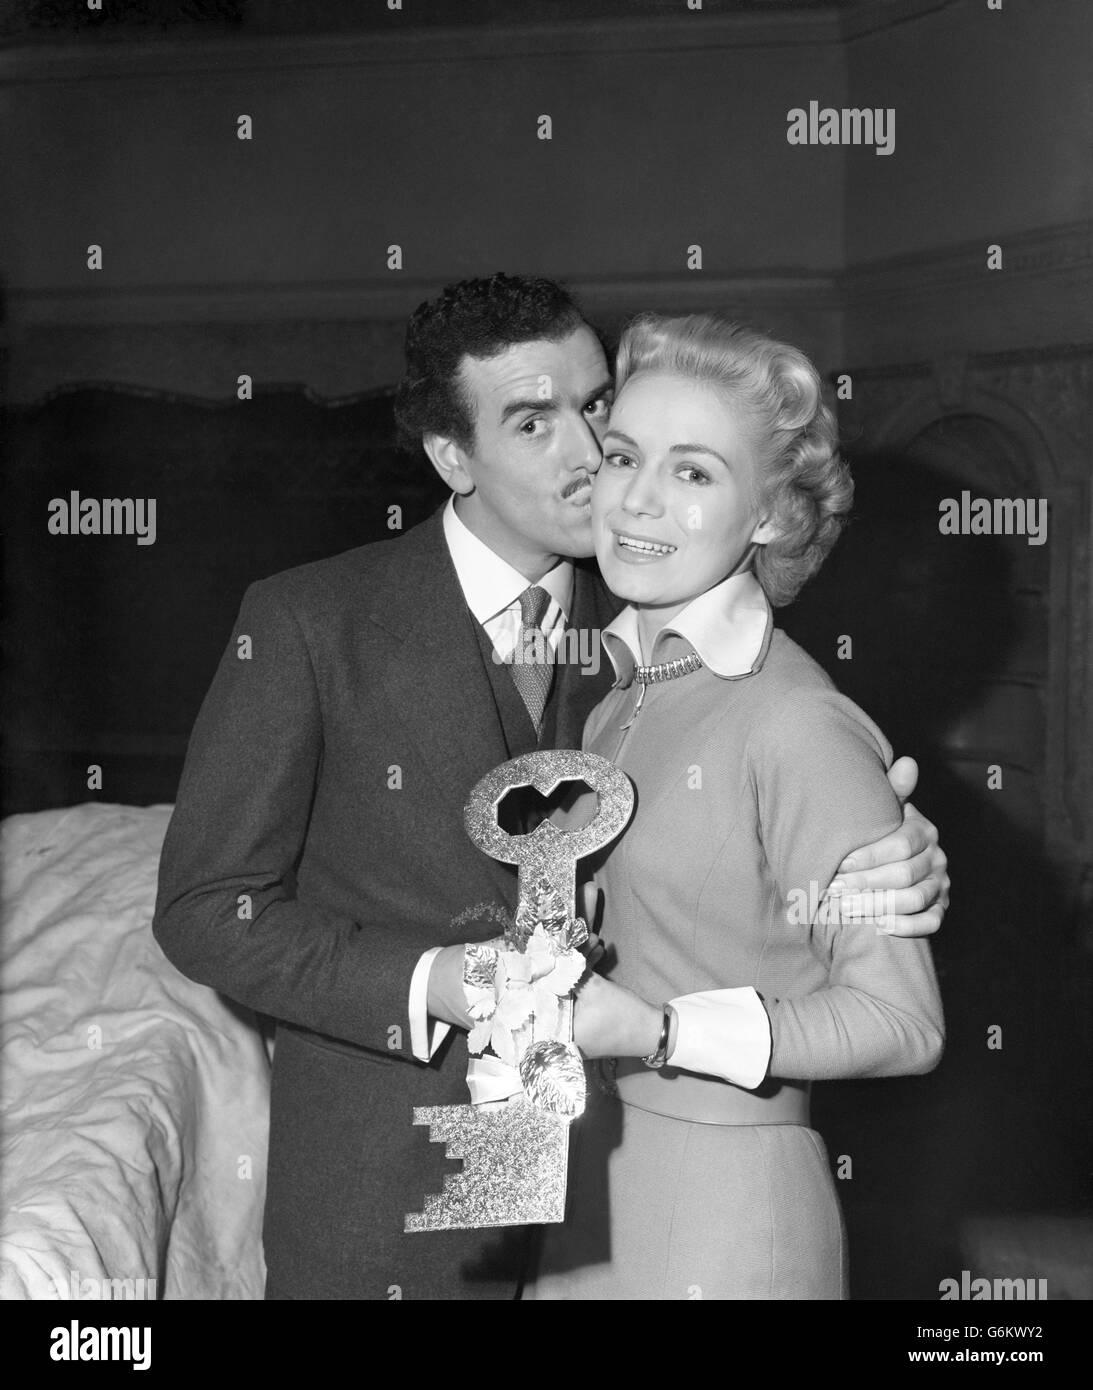 Film - George Cole - 'Will Any Gentleman?' Film Set - Elstree Studios, London - Stock Image